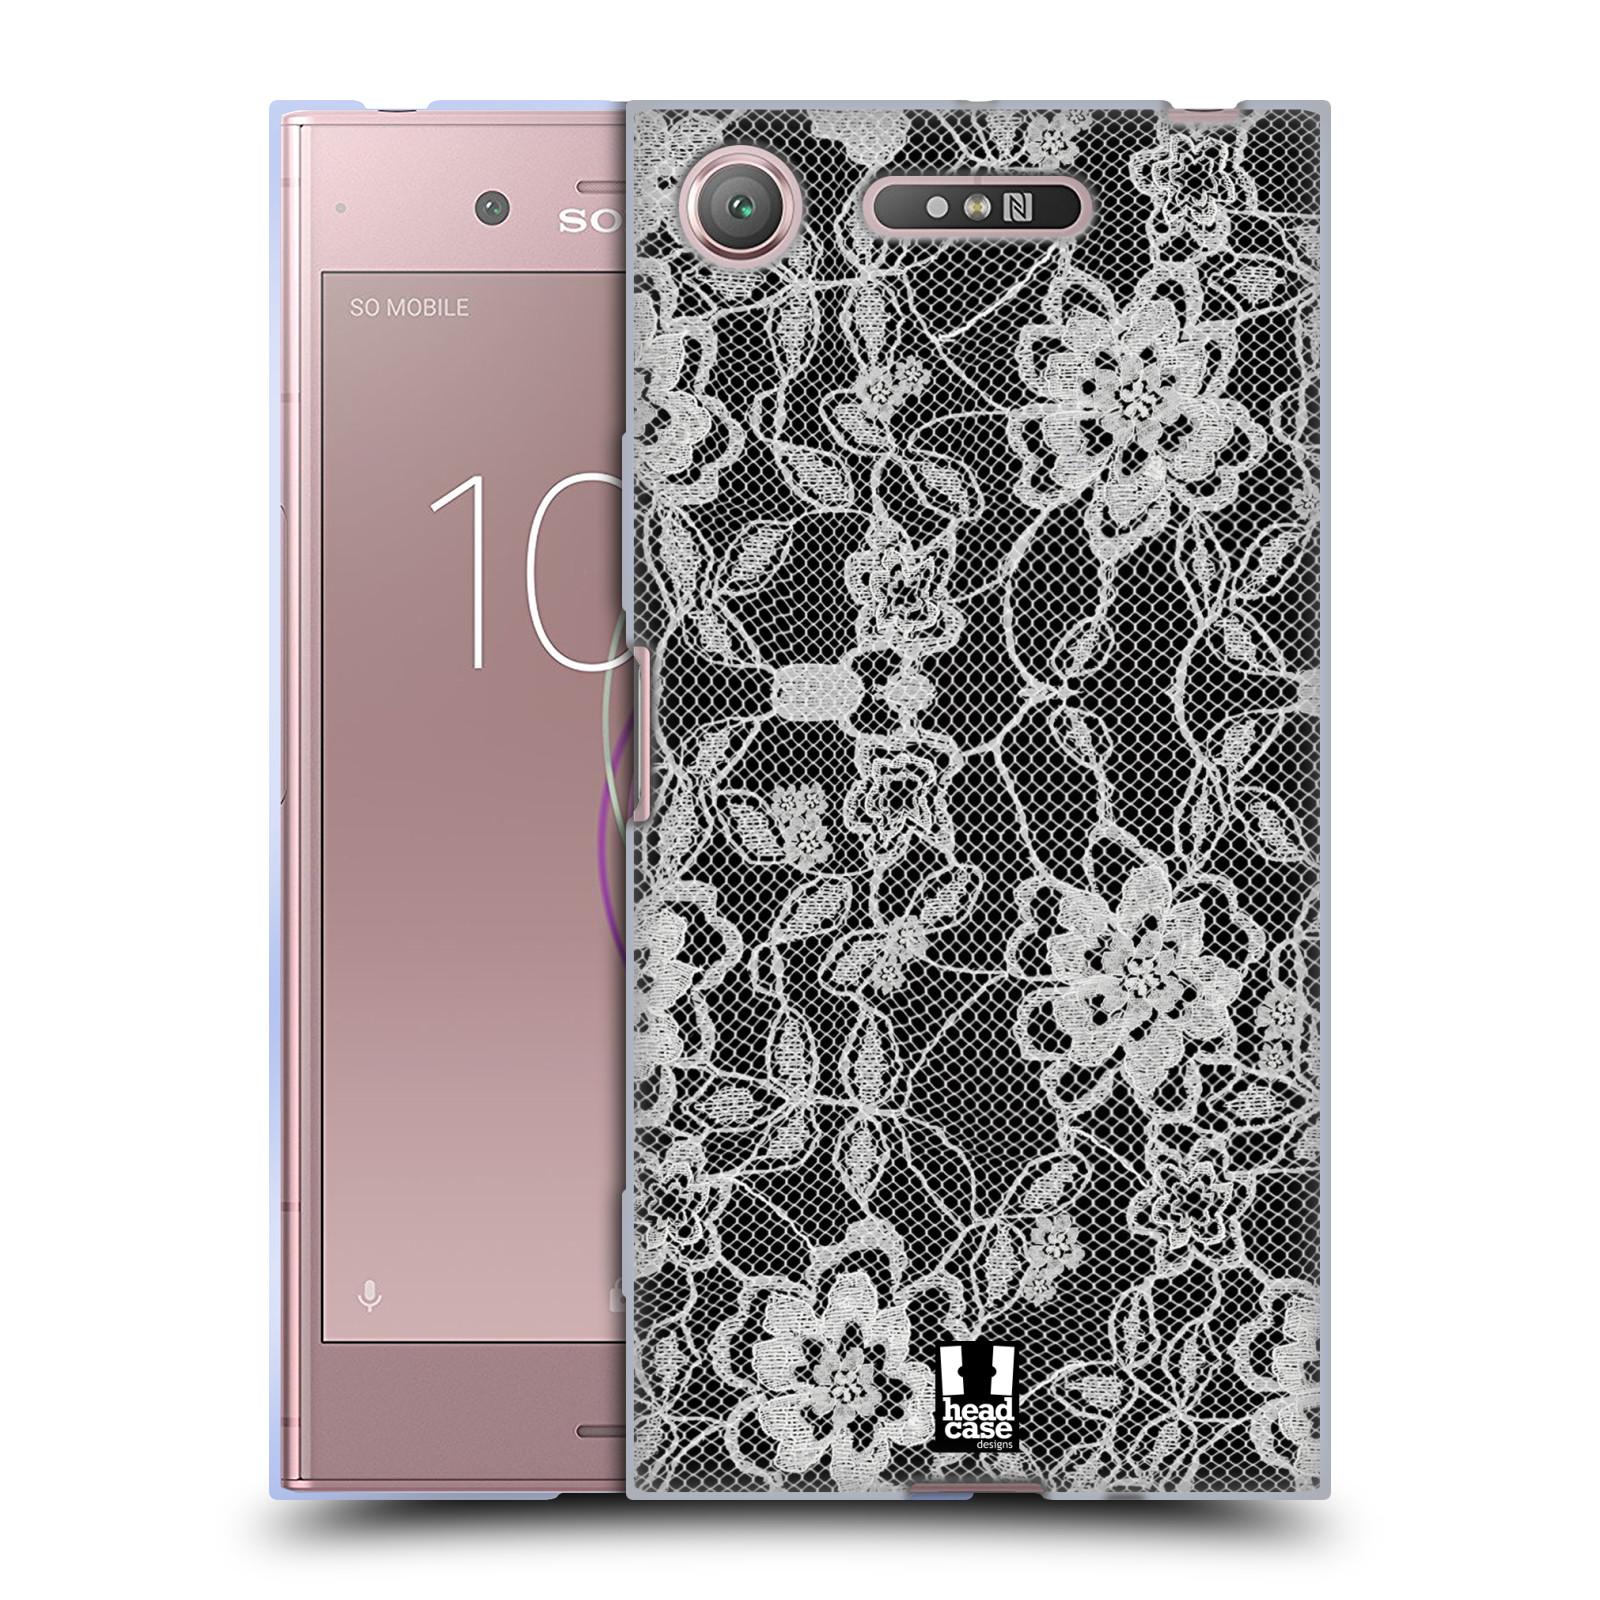 Silikonové pouzdro na mobil Sony Xperia XZ1 - Head Case - FLOWERY KRAJKA